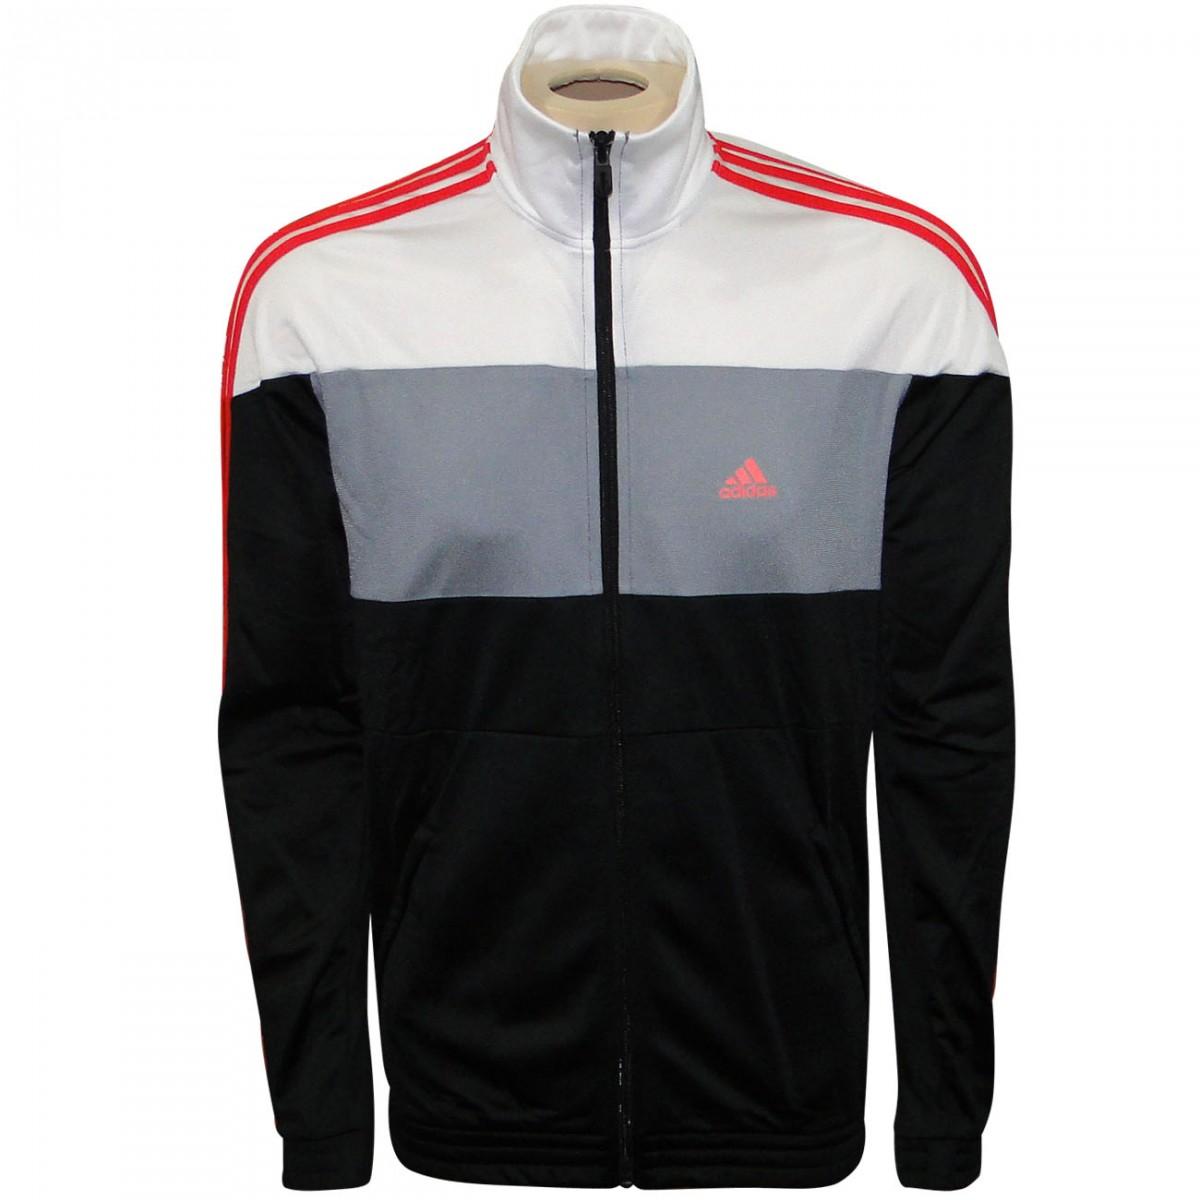 230ac1d4d23 Agasalho Adidas Ts Bts Kn F49190 - Preto Branco Chumbo Vermelho - Chuteira  Nike